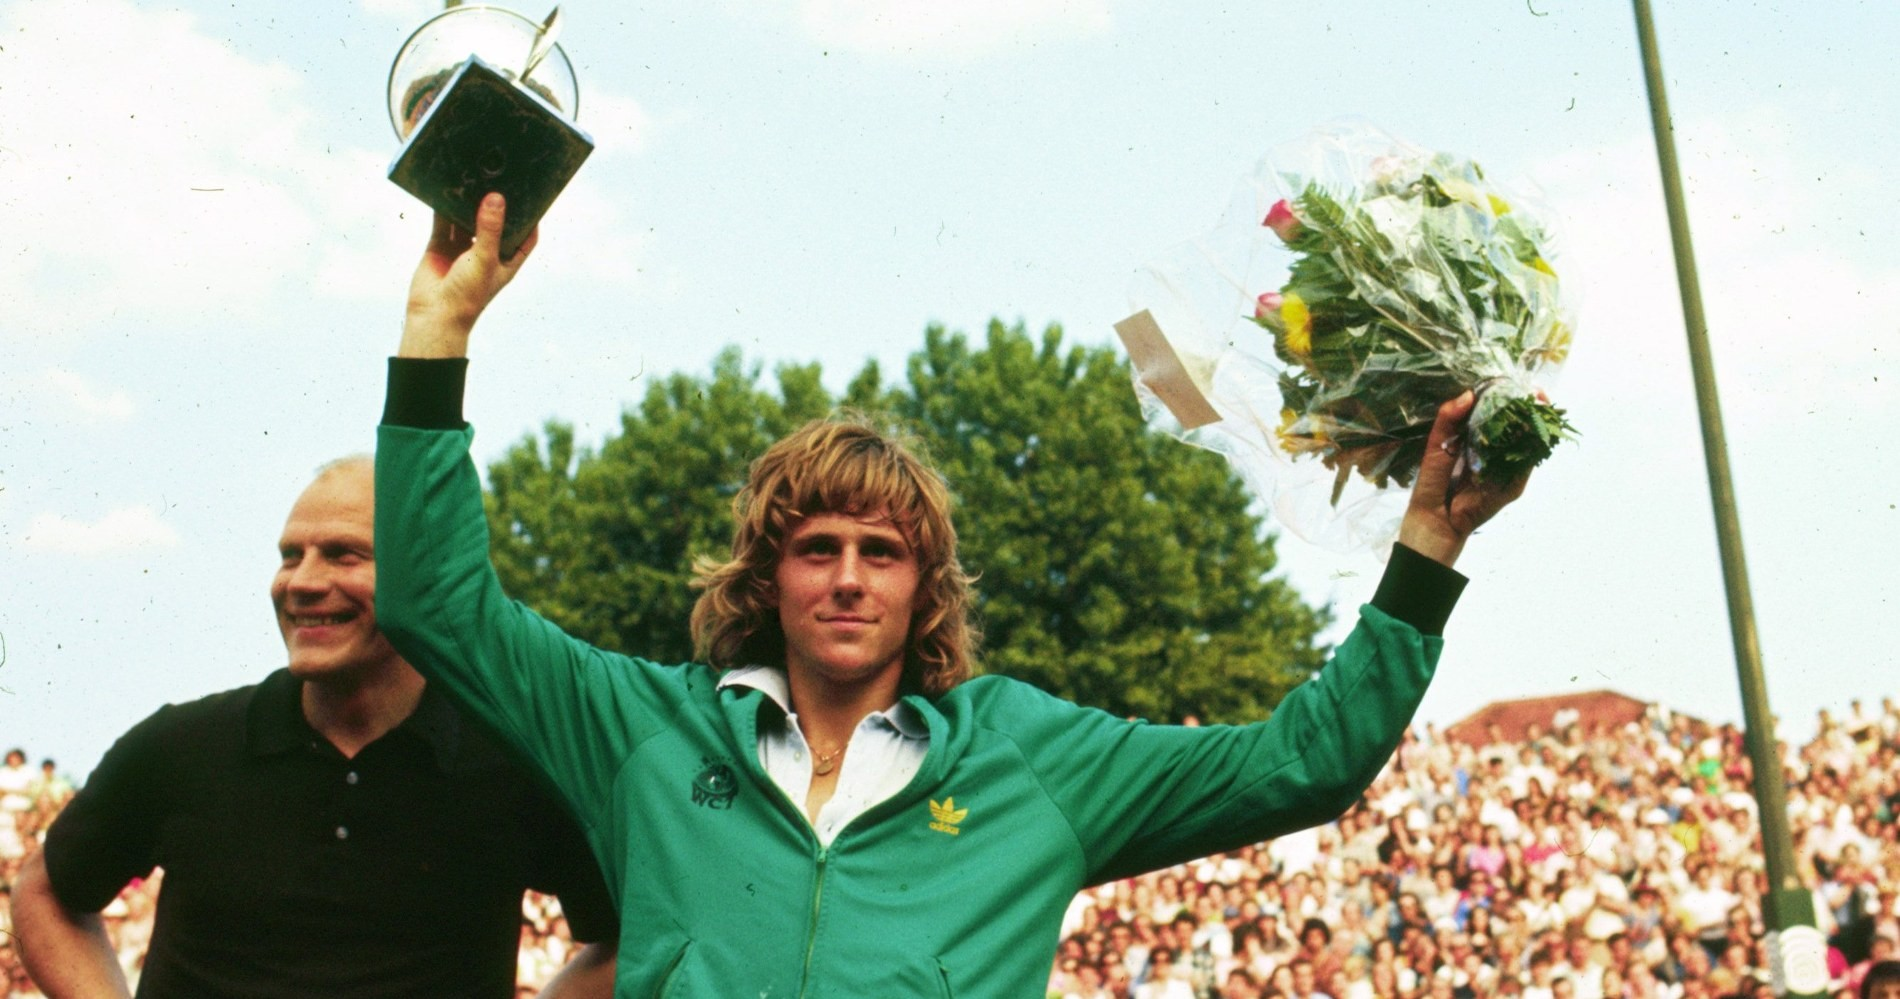 Bjorn Borg Roland Garros 1974